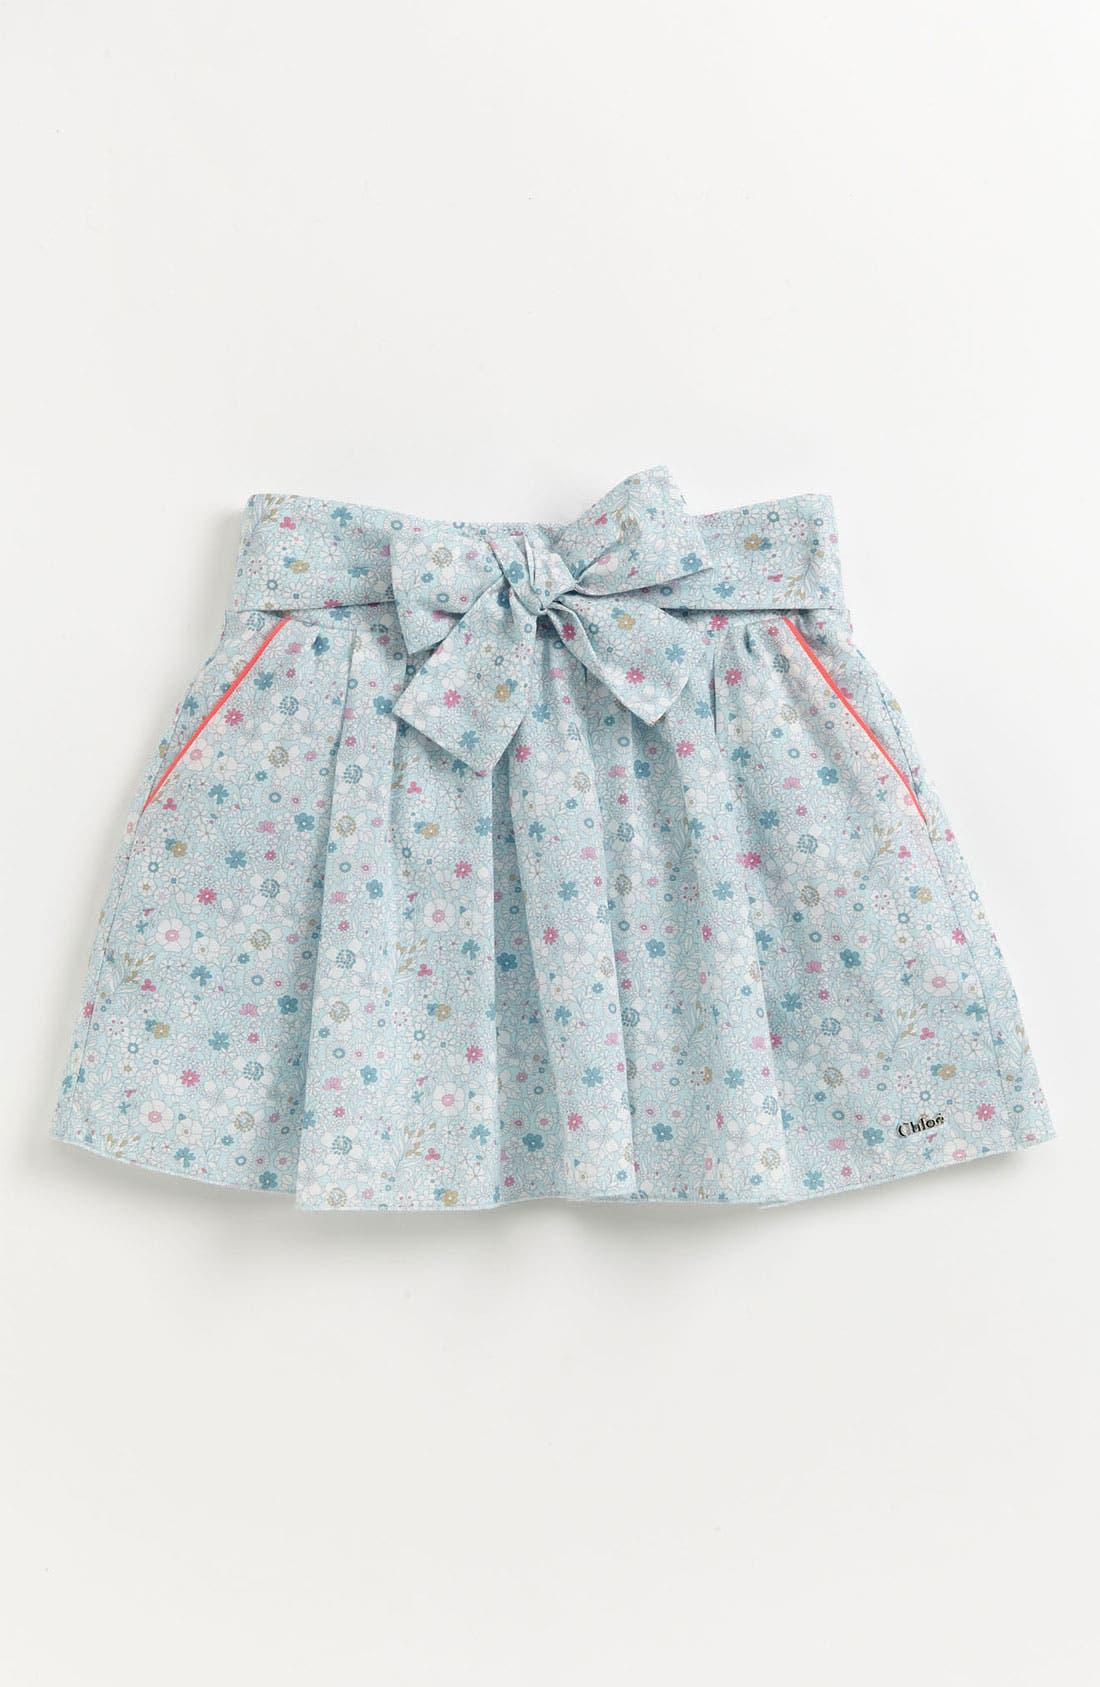 Main Image - Chloé 'Liberty Print' Floral Skirt (Toddler, Little Girls & Big Girls)